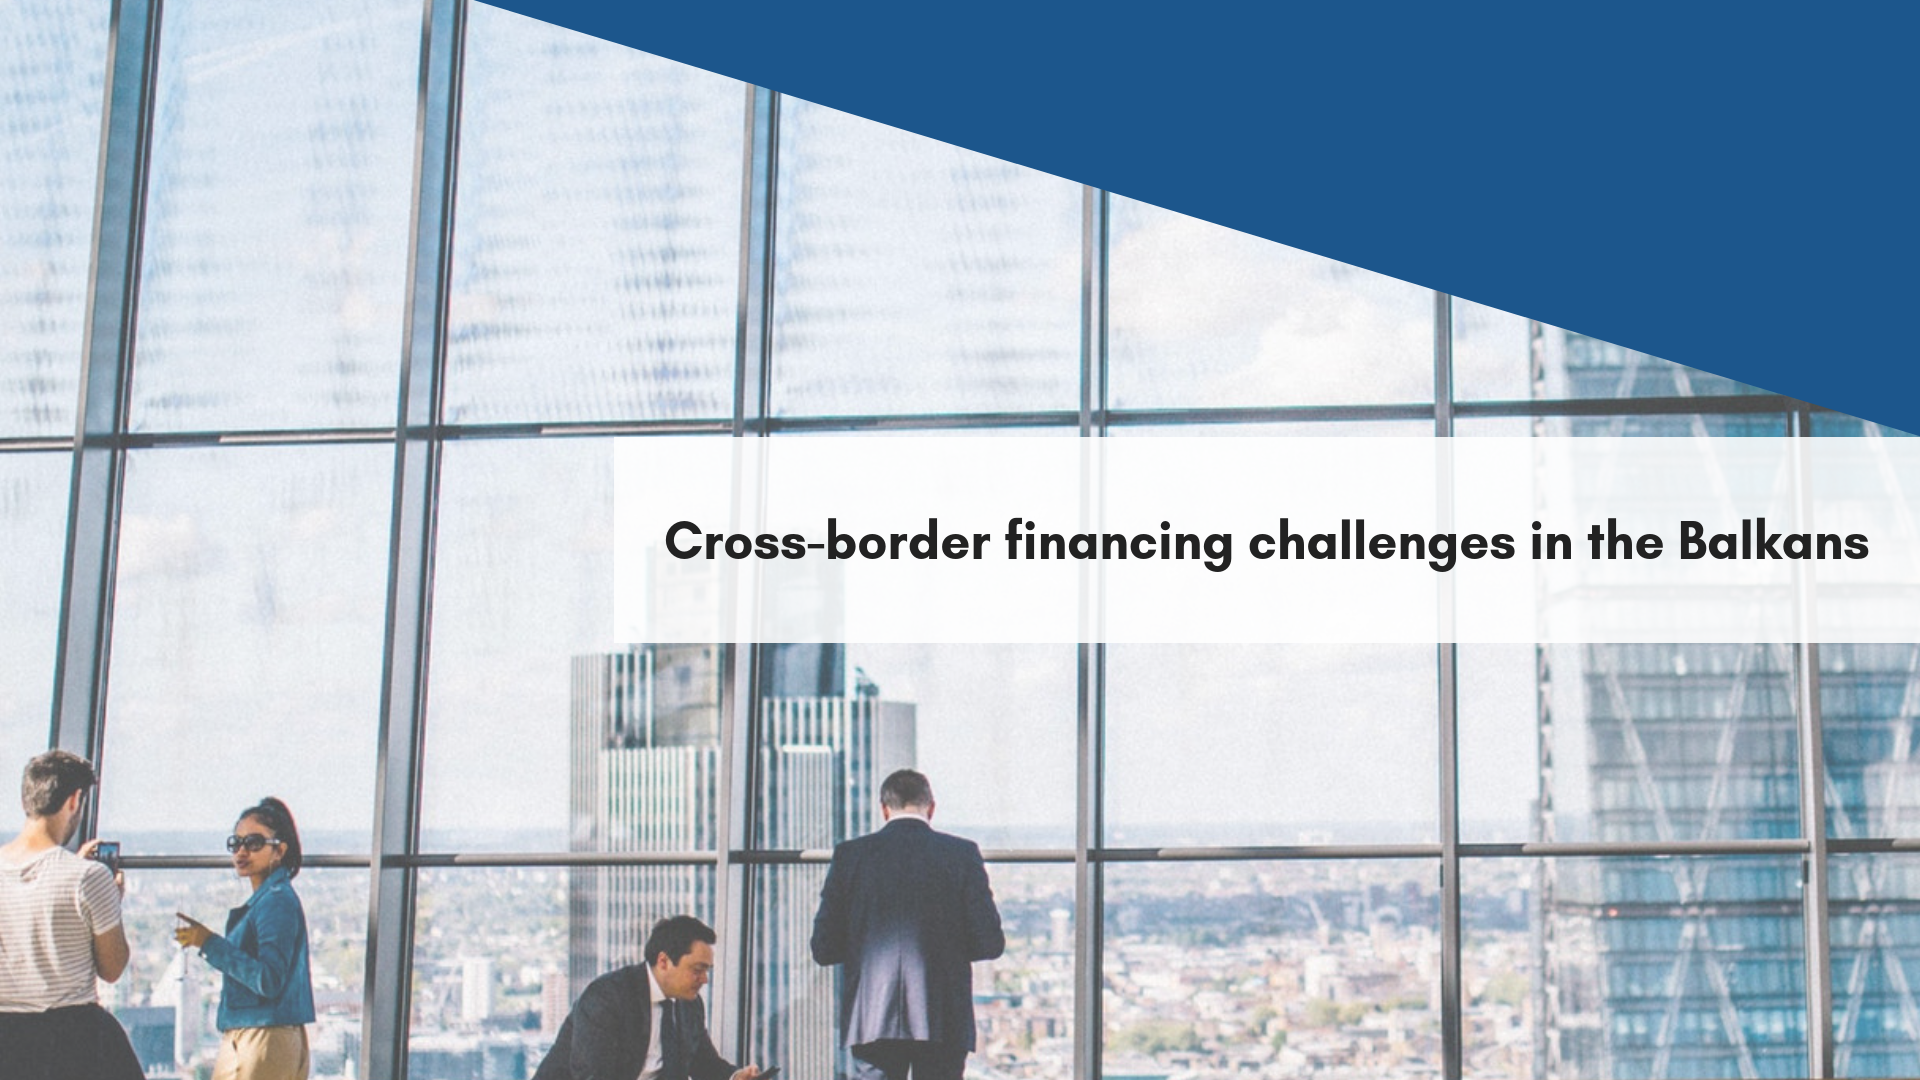 Financing challenges